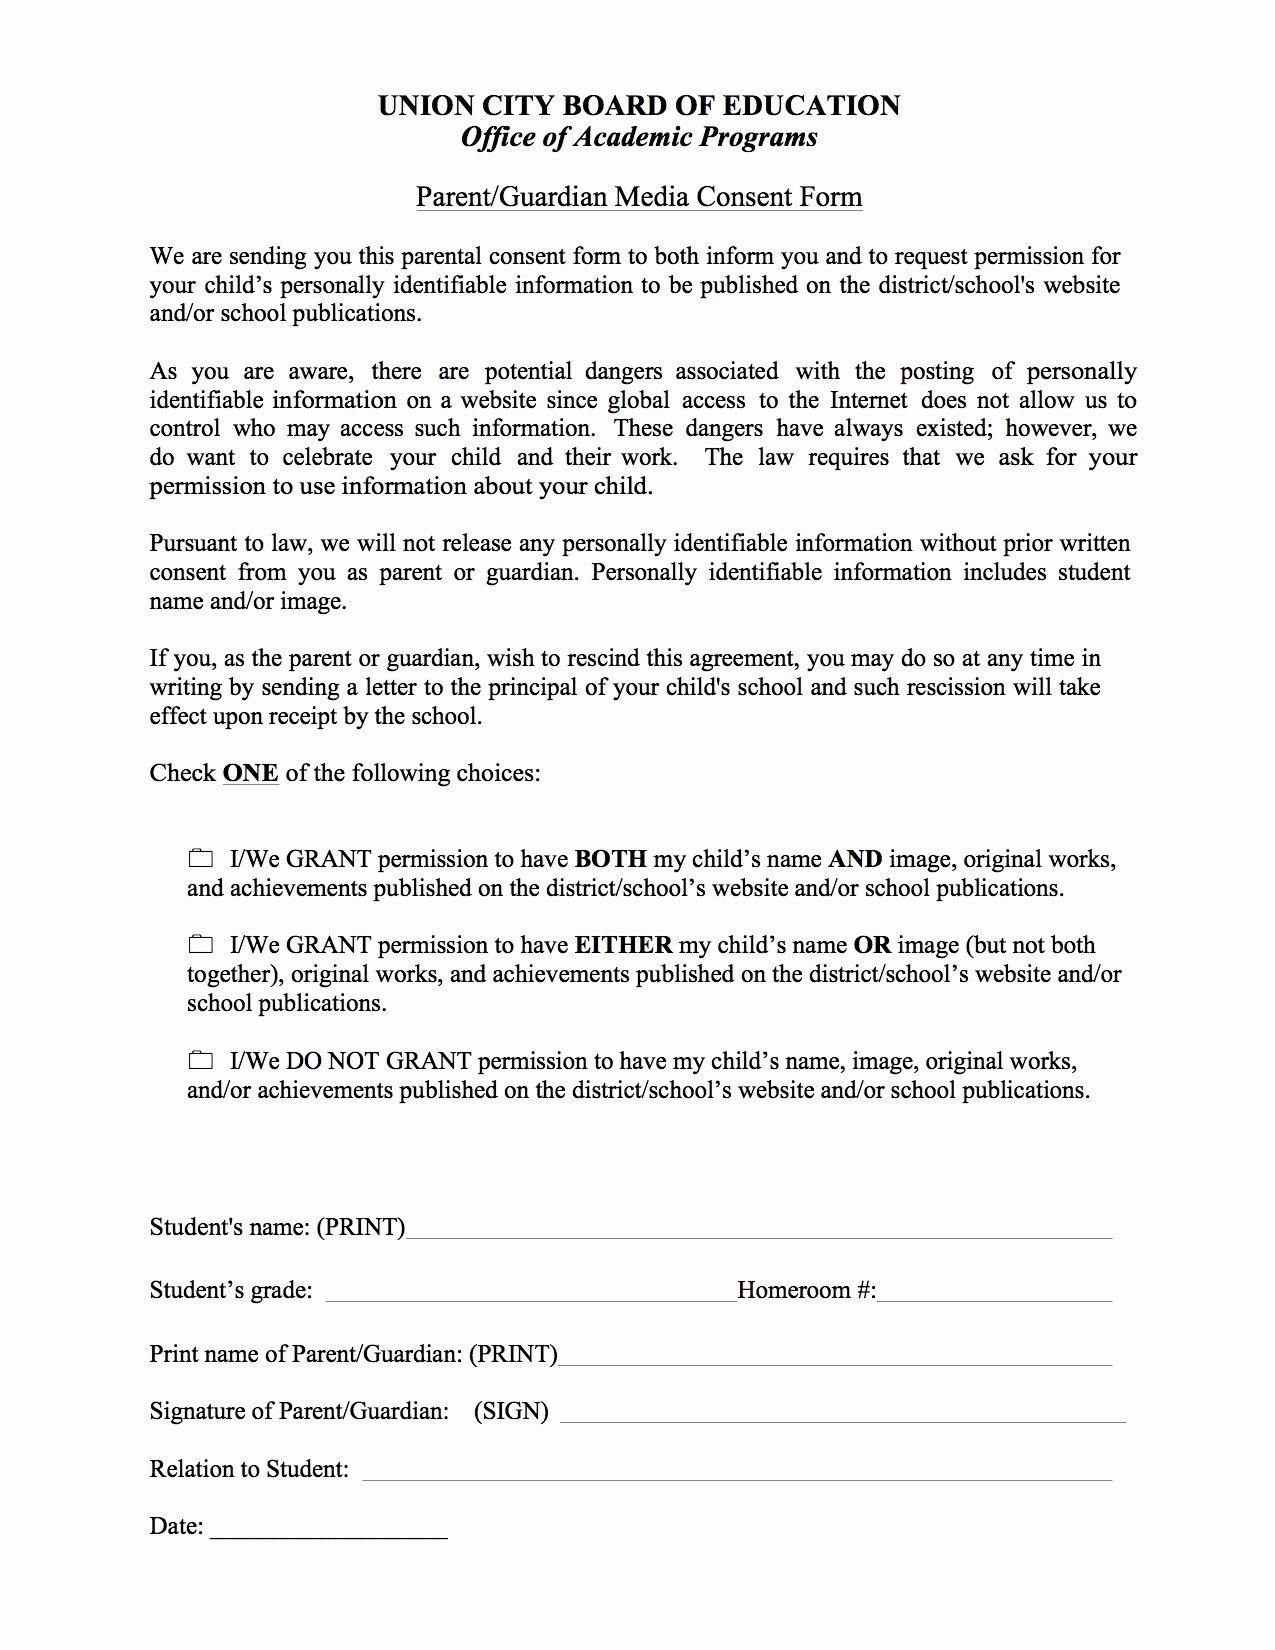 School Media Release form Awesome Parent Consent form Basics Union City Public Schools